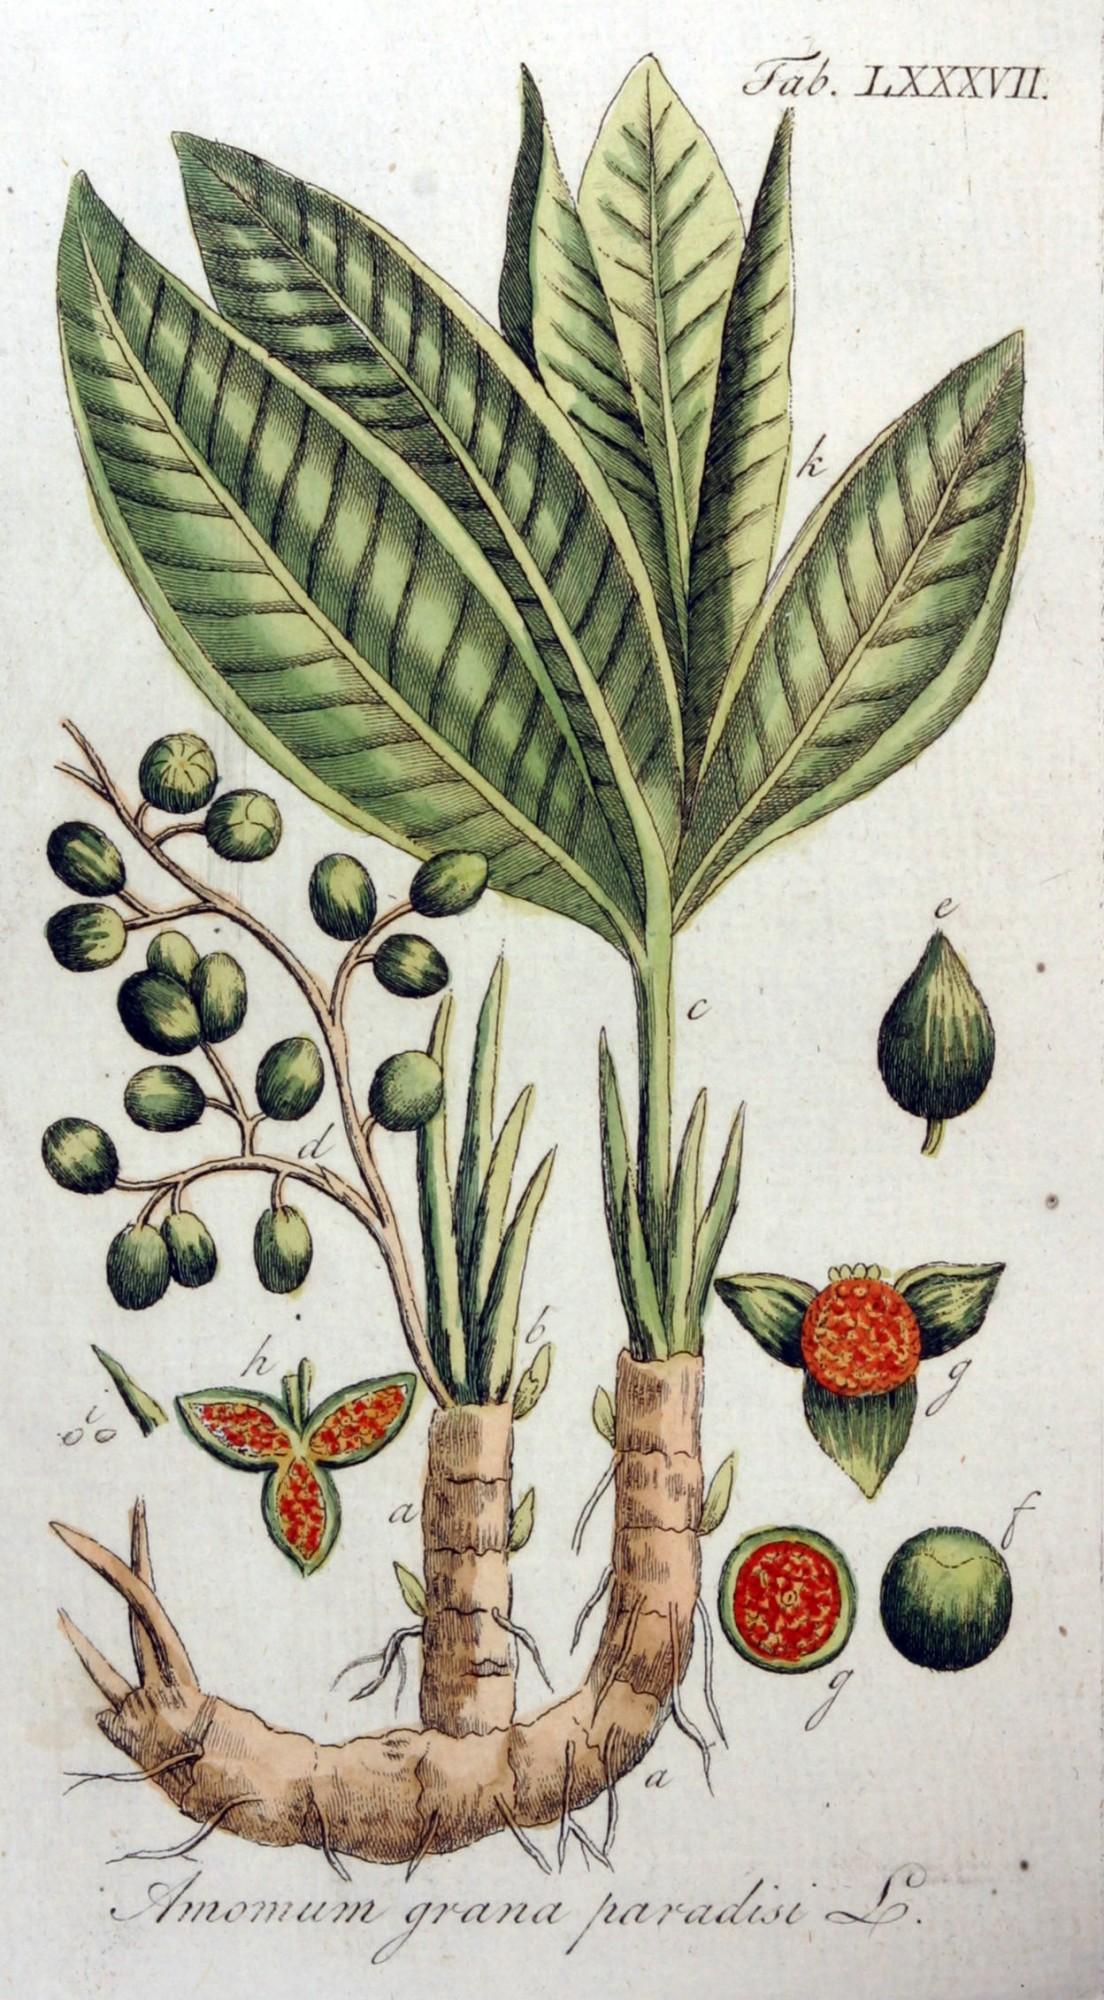 Guinejské korenie_Aframomum melegueta - zdroj: http://upload.wikimedia.org/wikipedia/commons/5/51/Amomum_grana_paradisi_Ypey87.jpg